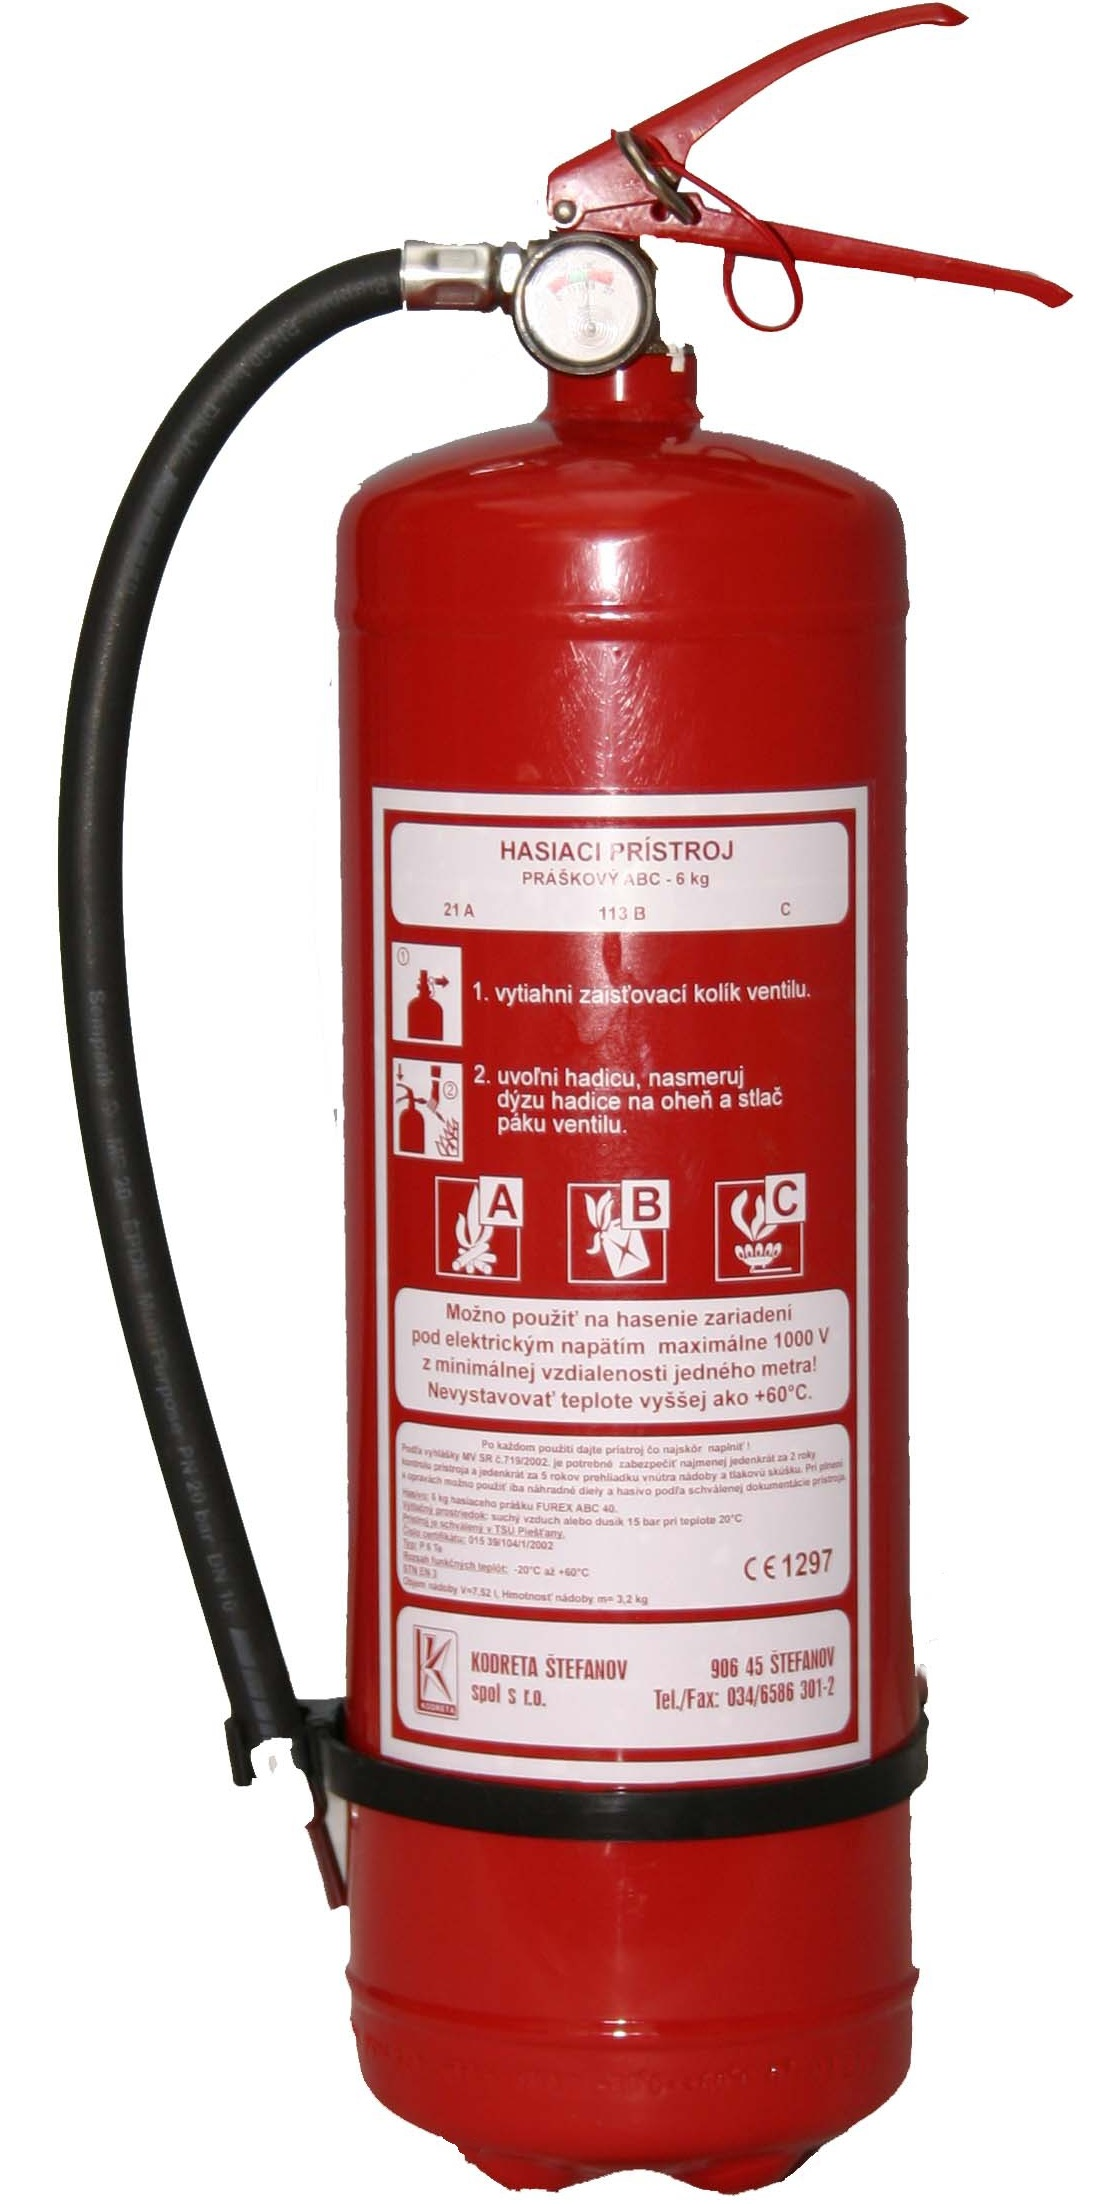 hasiaci-pristroj-praskovy-6-kg